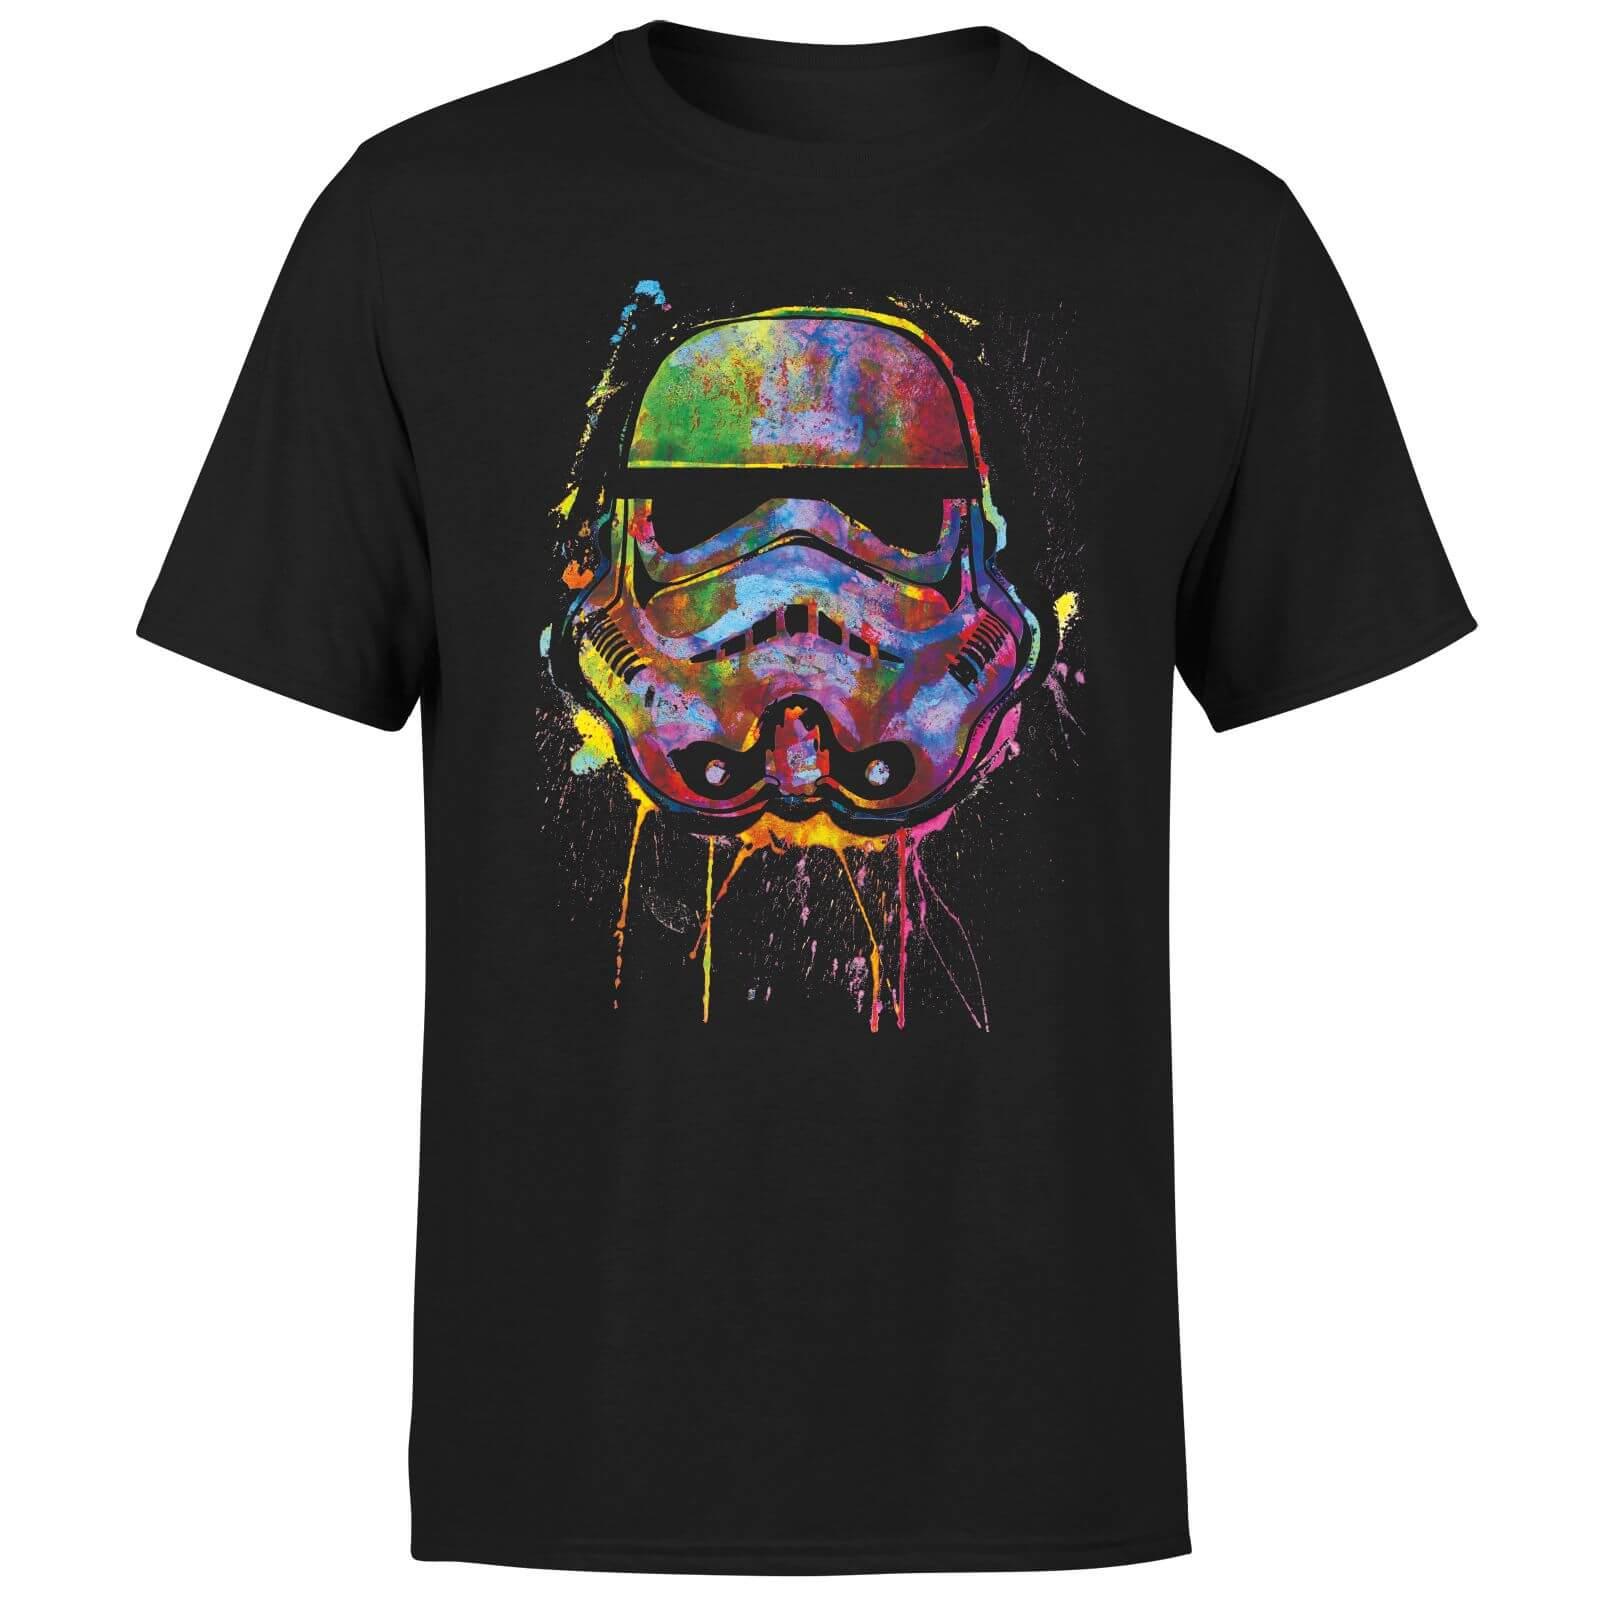 Star Wars Stormtrooper Splat T-Shirt (100% Baumwolle) | Pullover ab 18,99€